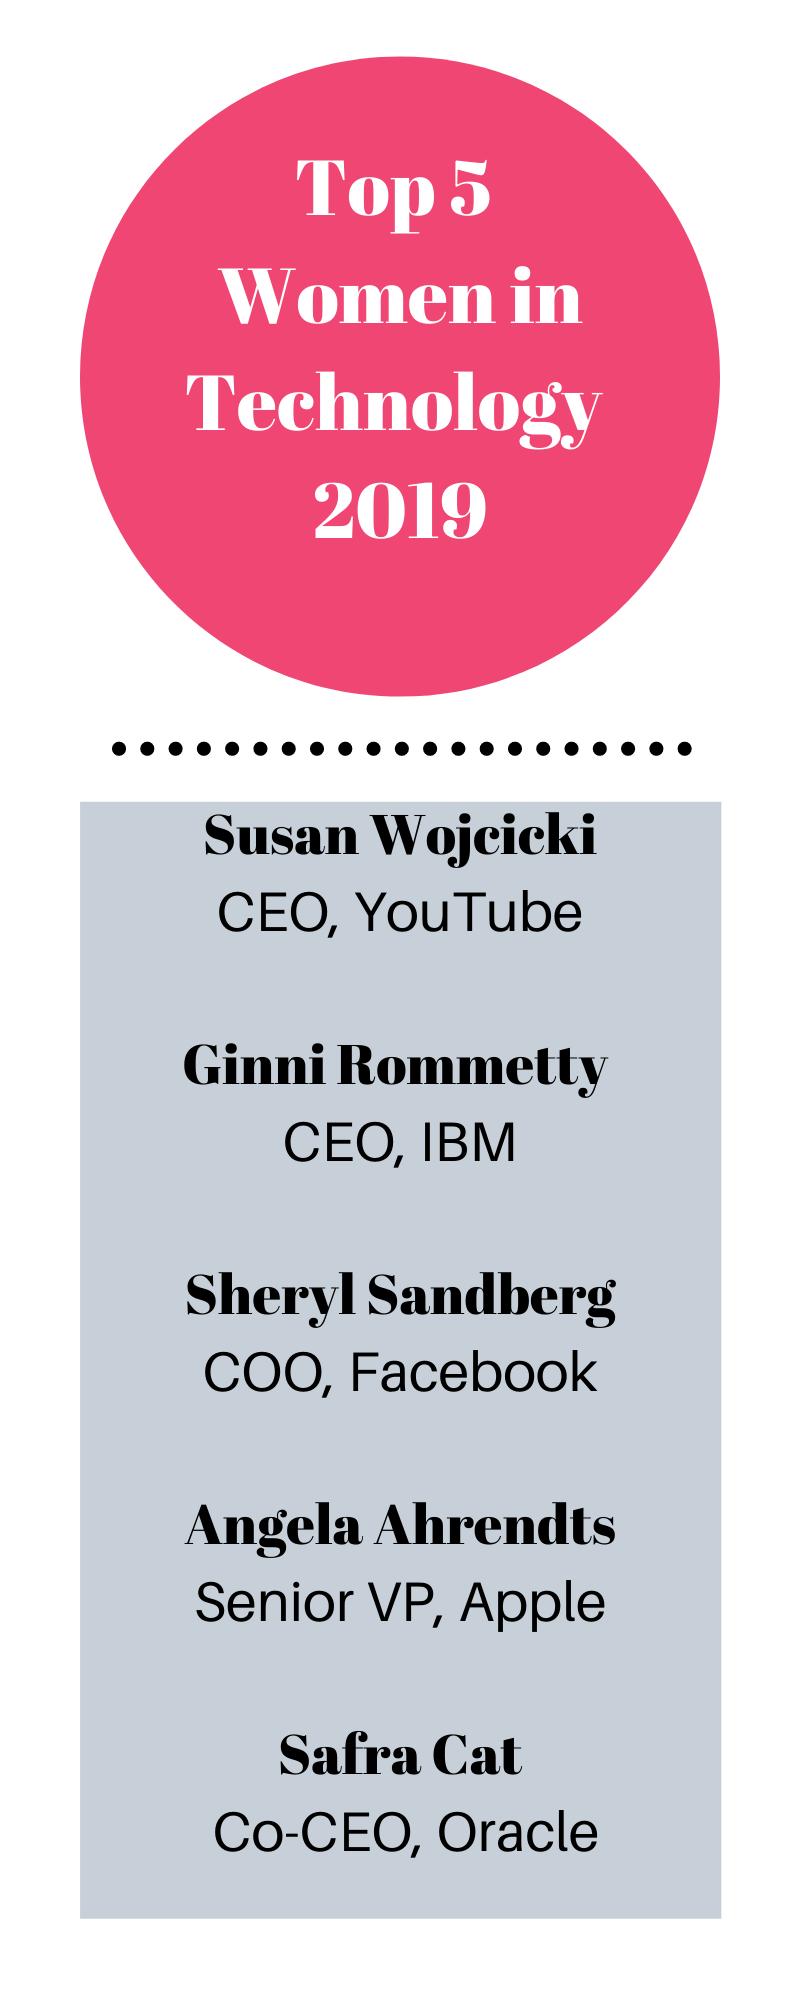 infographic top 5 women in technology tech STEM